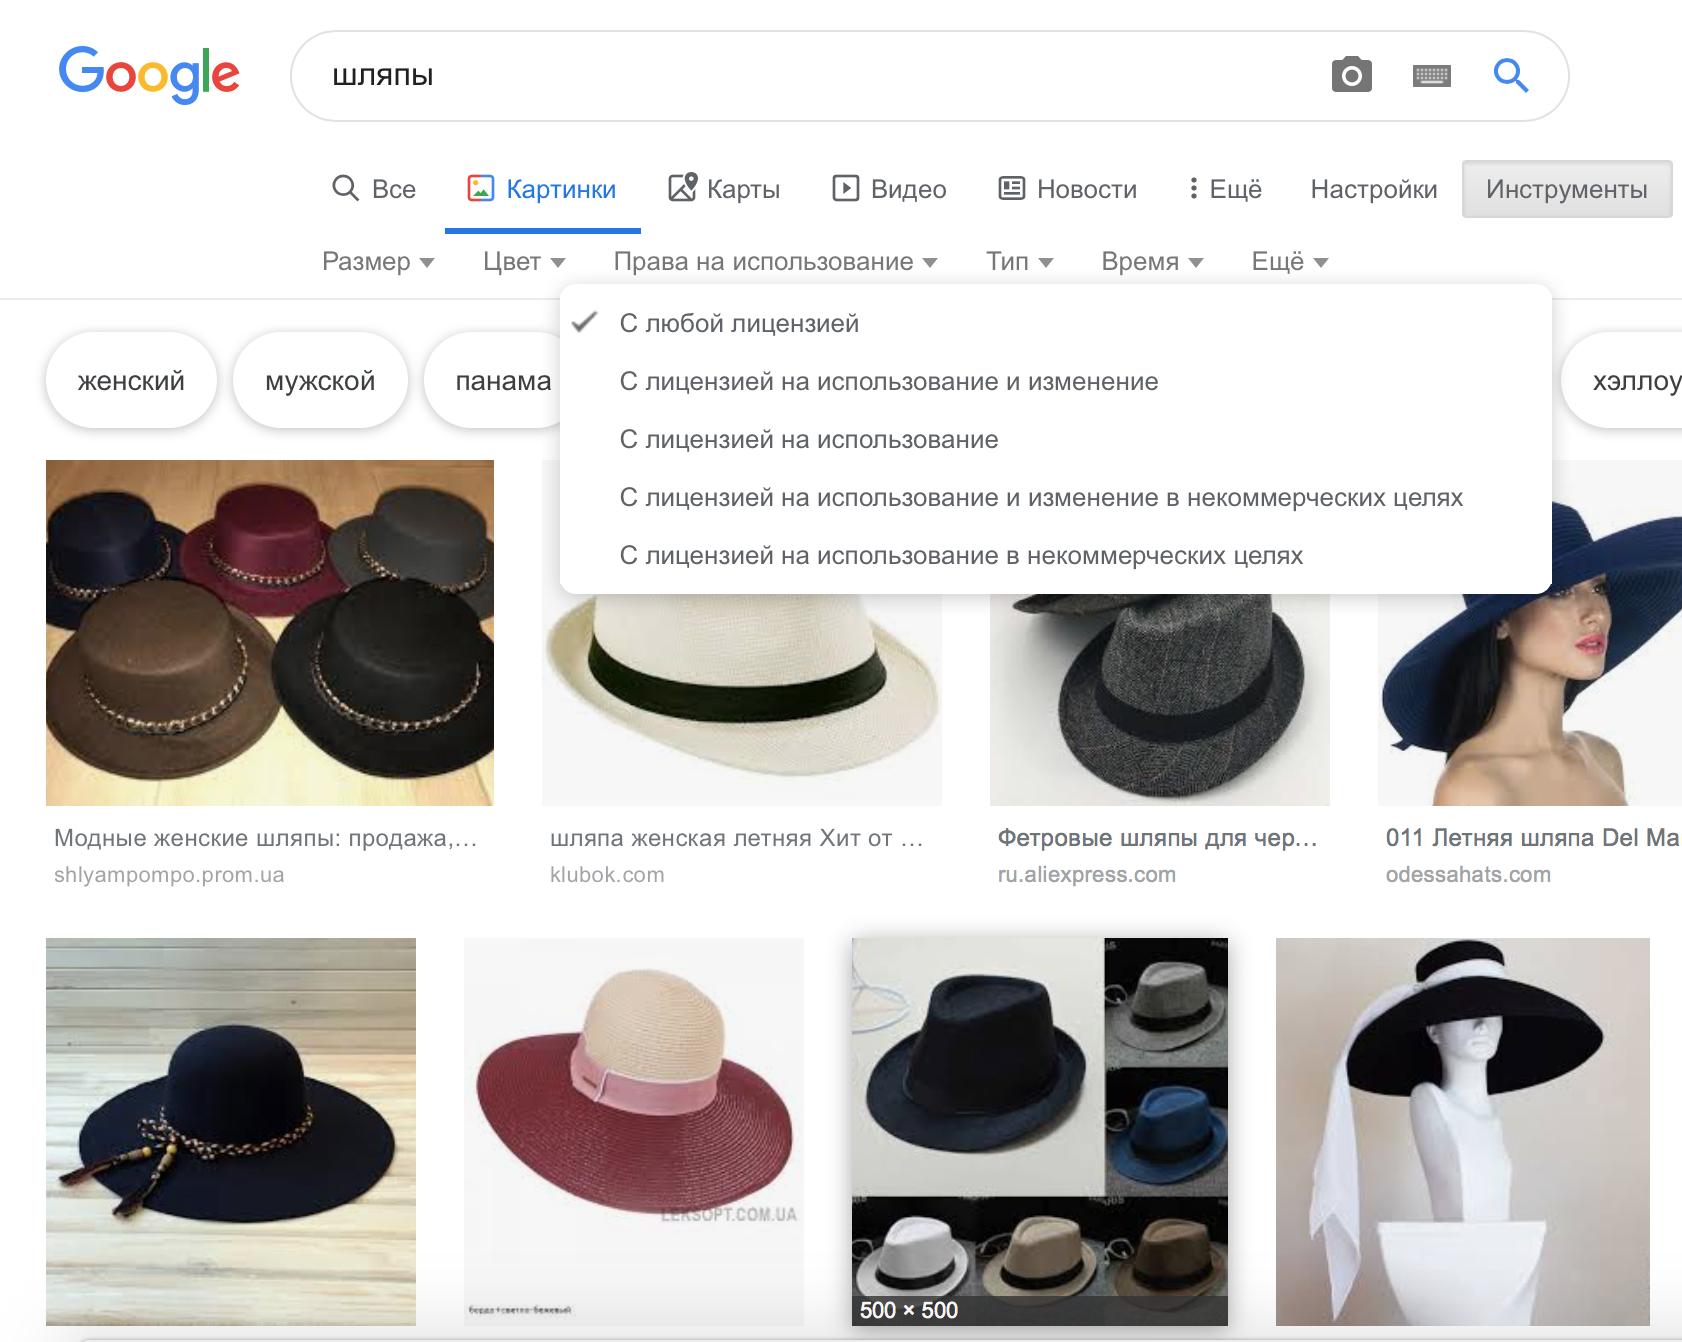 картинки гугл право на использование